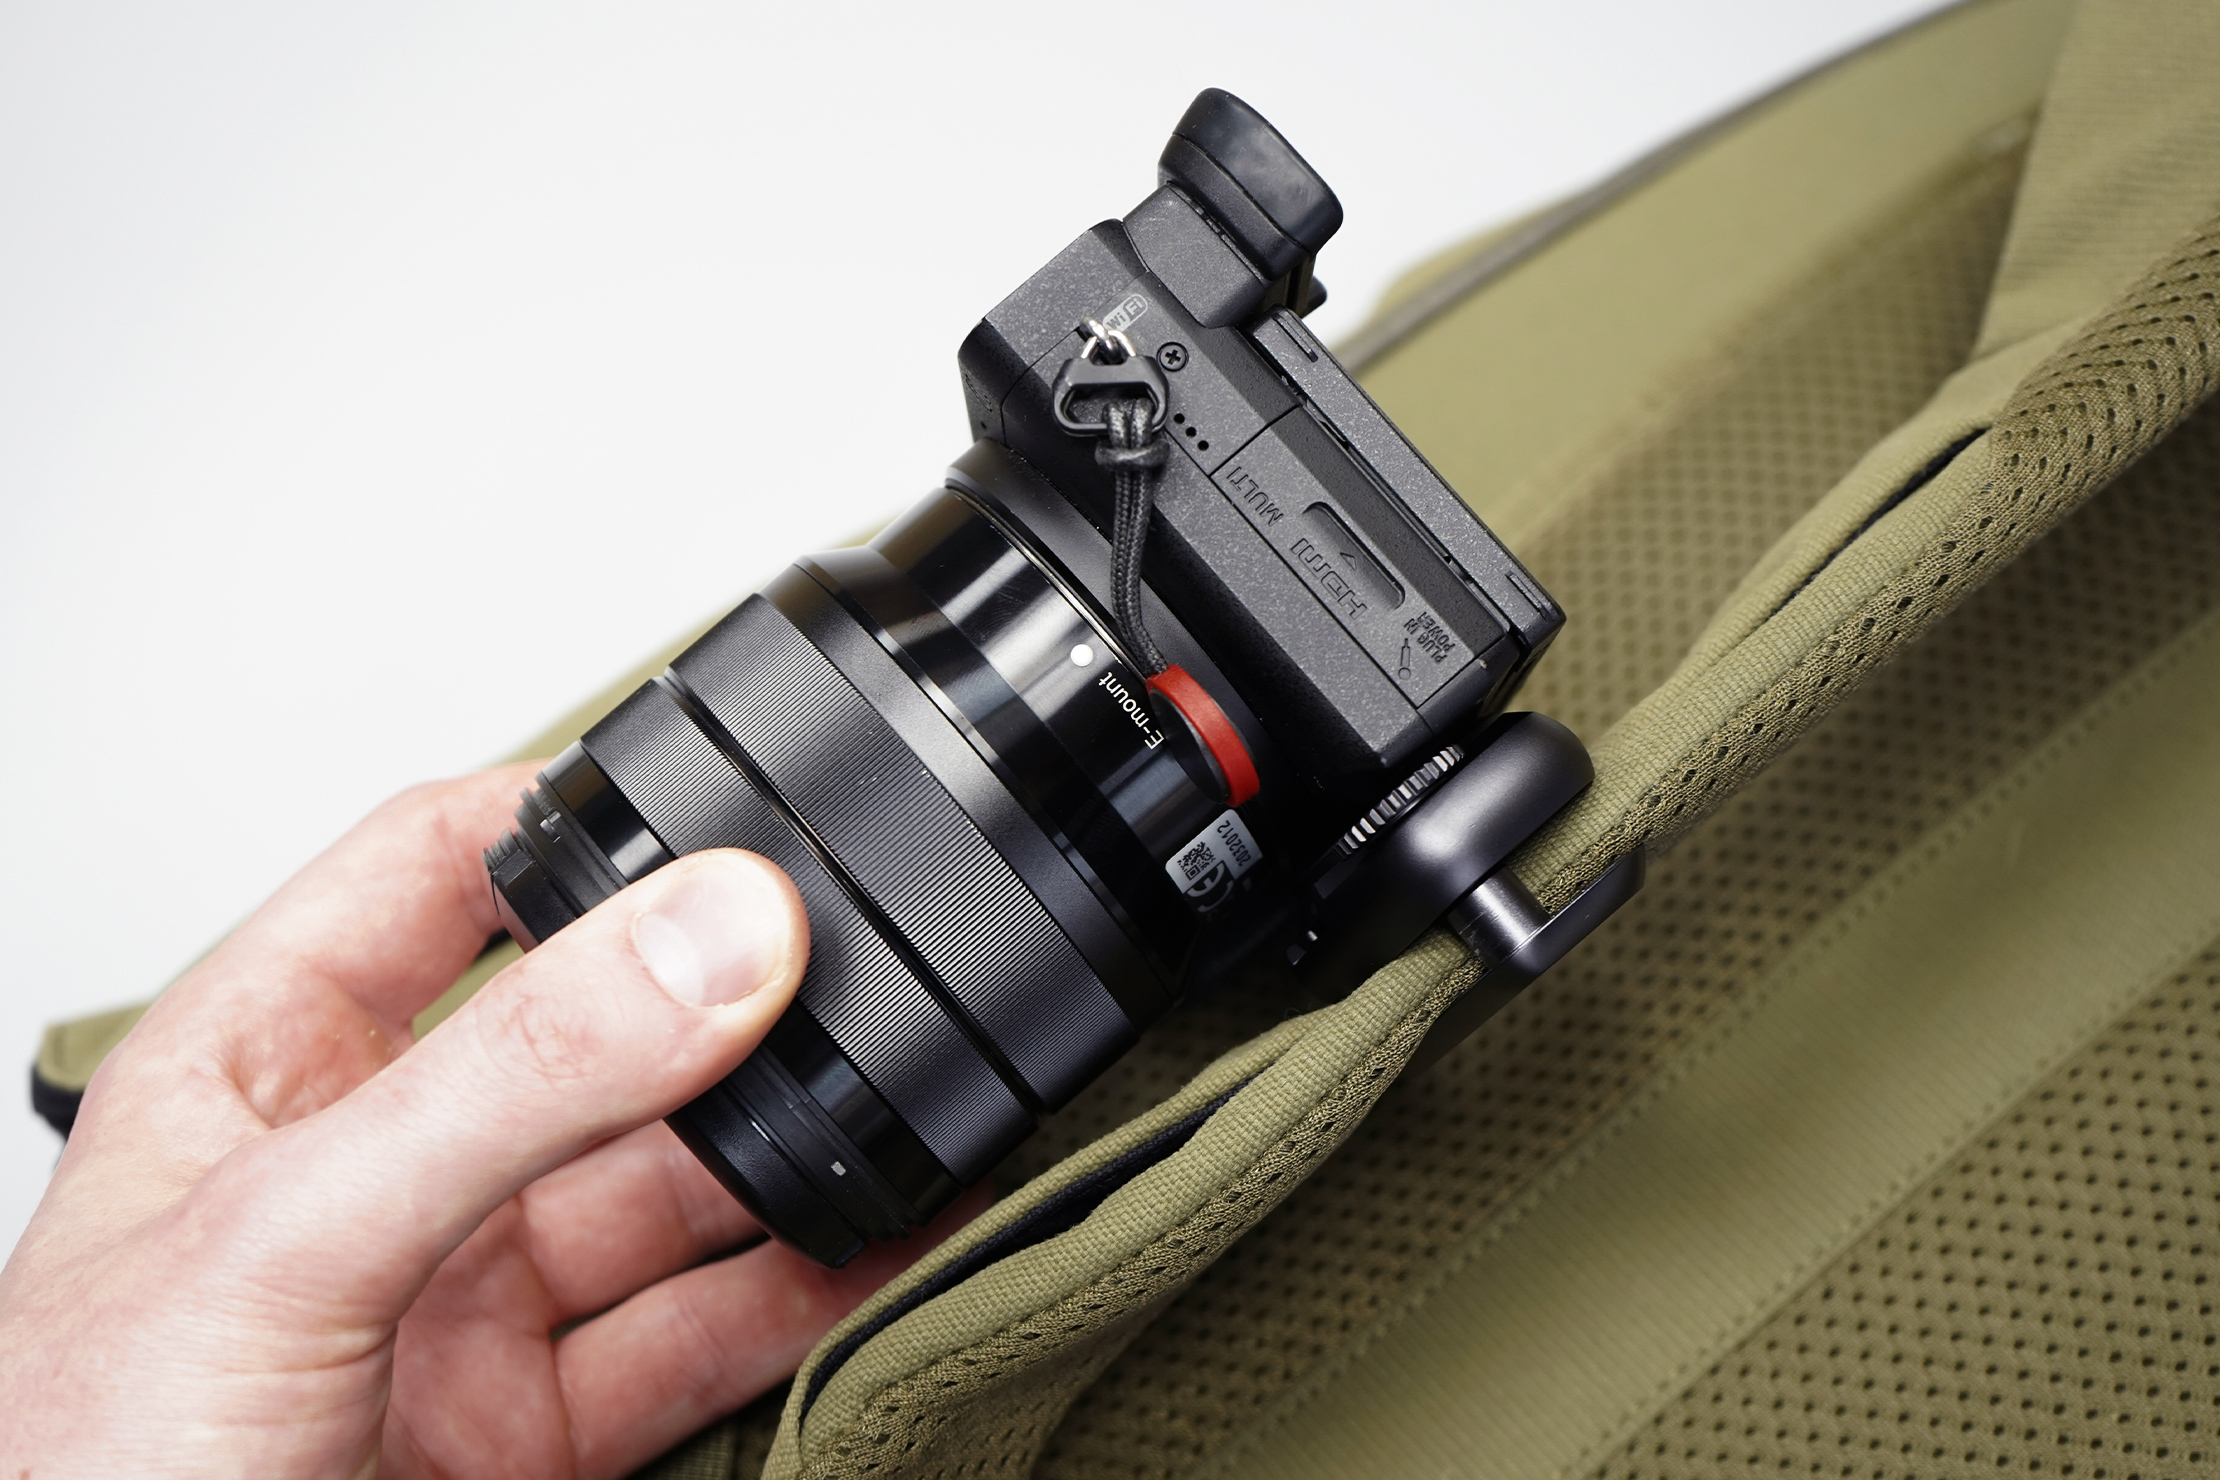 Peak Design Capture Clip | Camera mounted on the clip